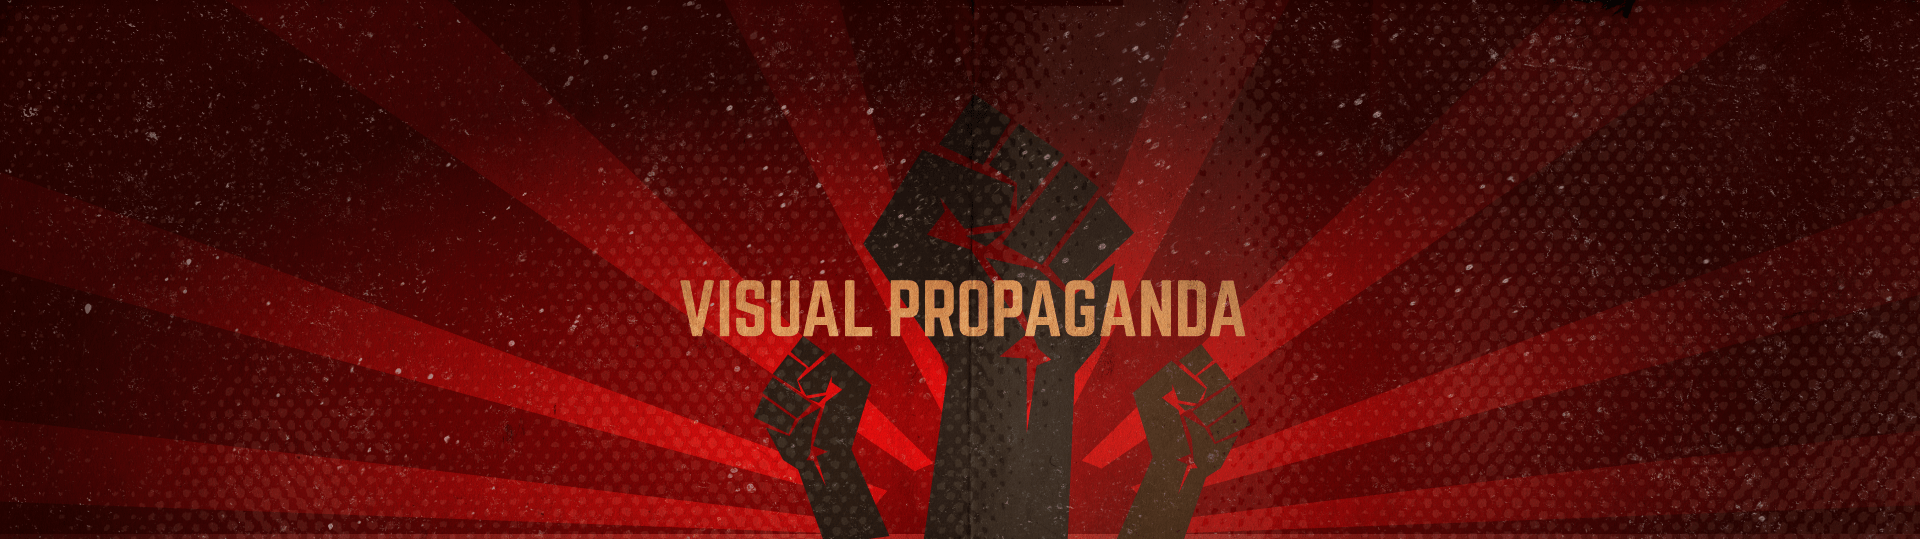 VisualPropaganda_01 (1)